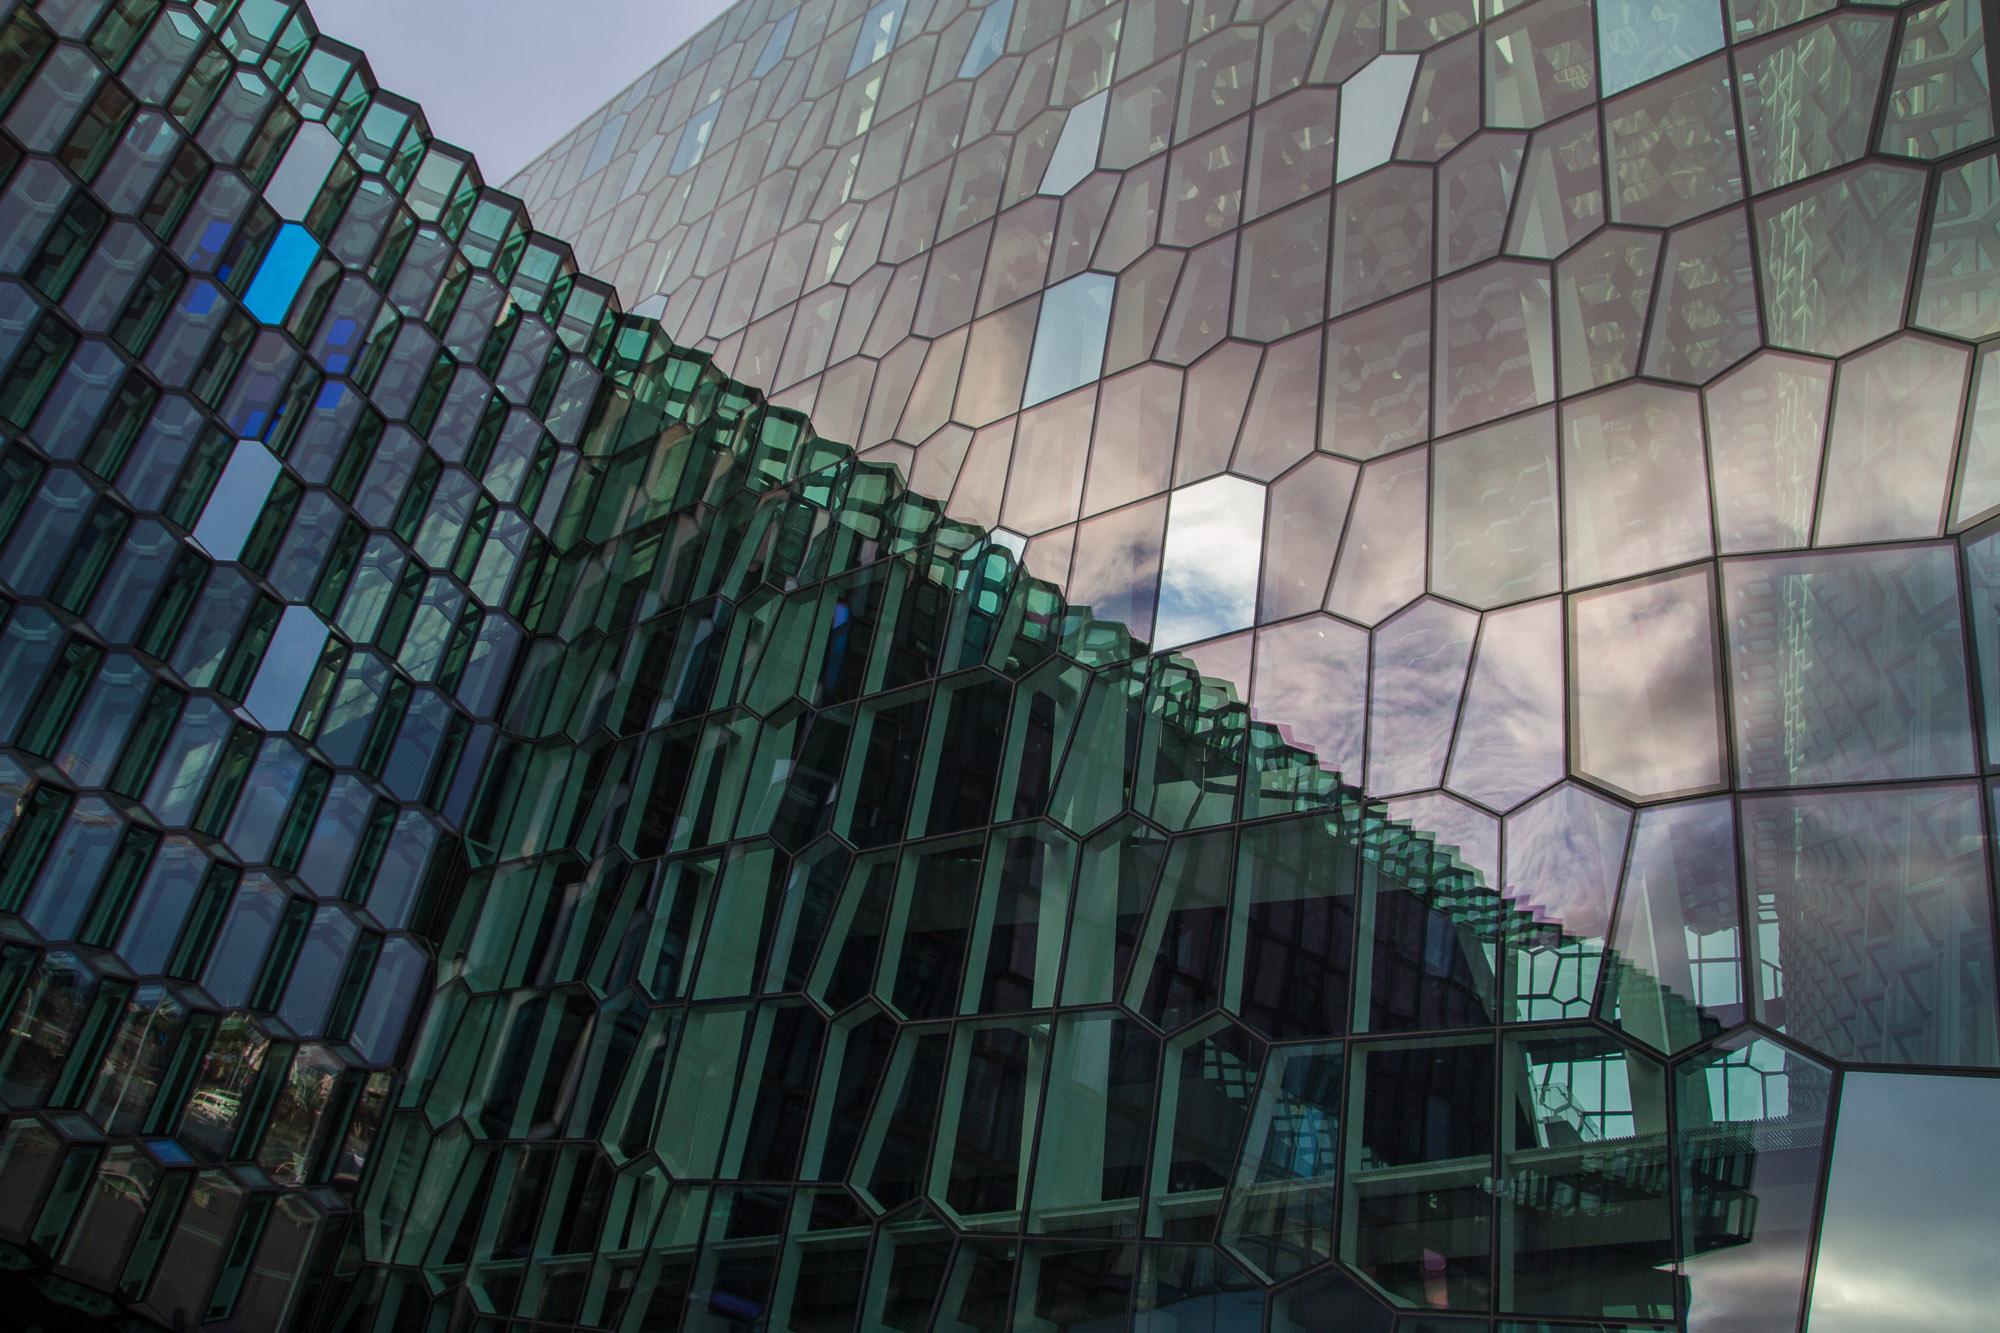 Façade, Harpa, Reykjavik (2)